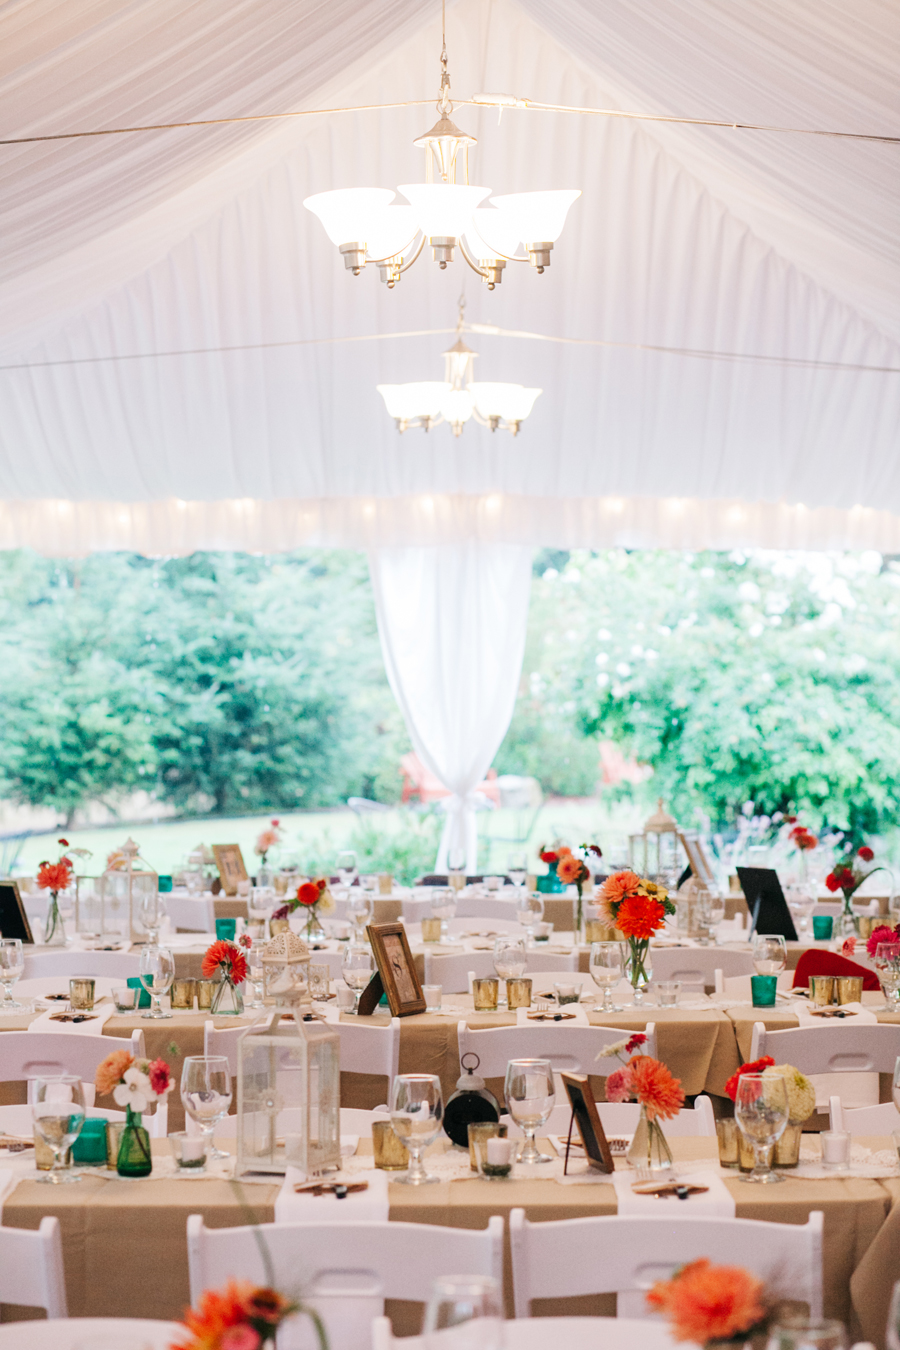 060-bellingham-wedding-photographer-katheryn-moran-photography-farm-kitchen.jpg